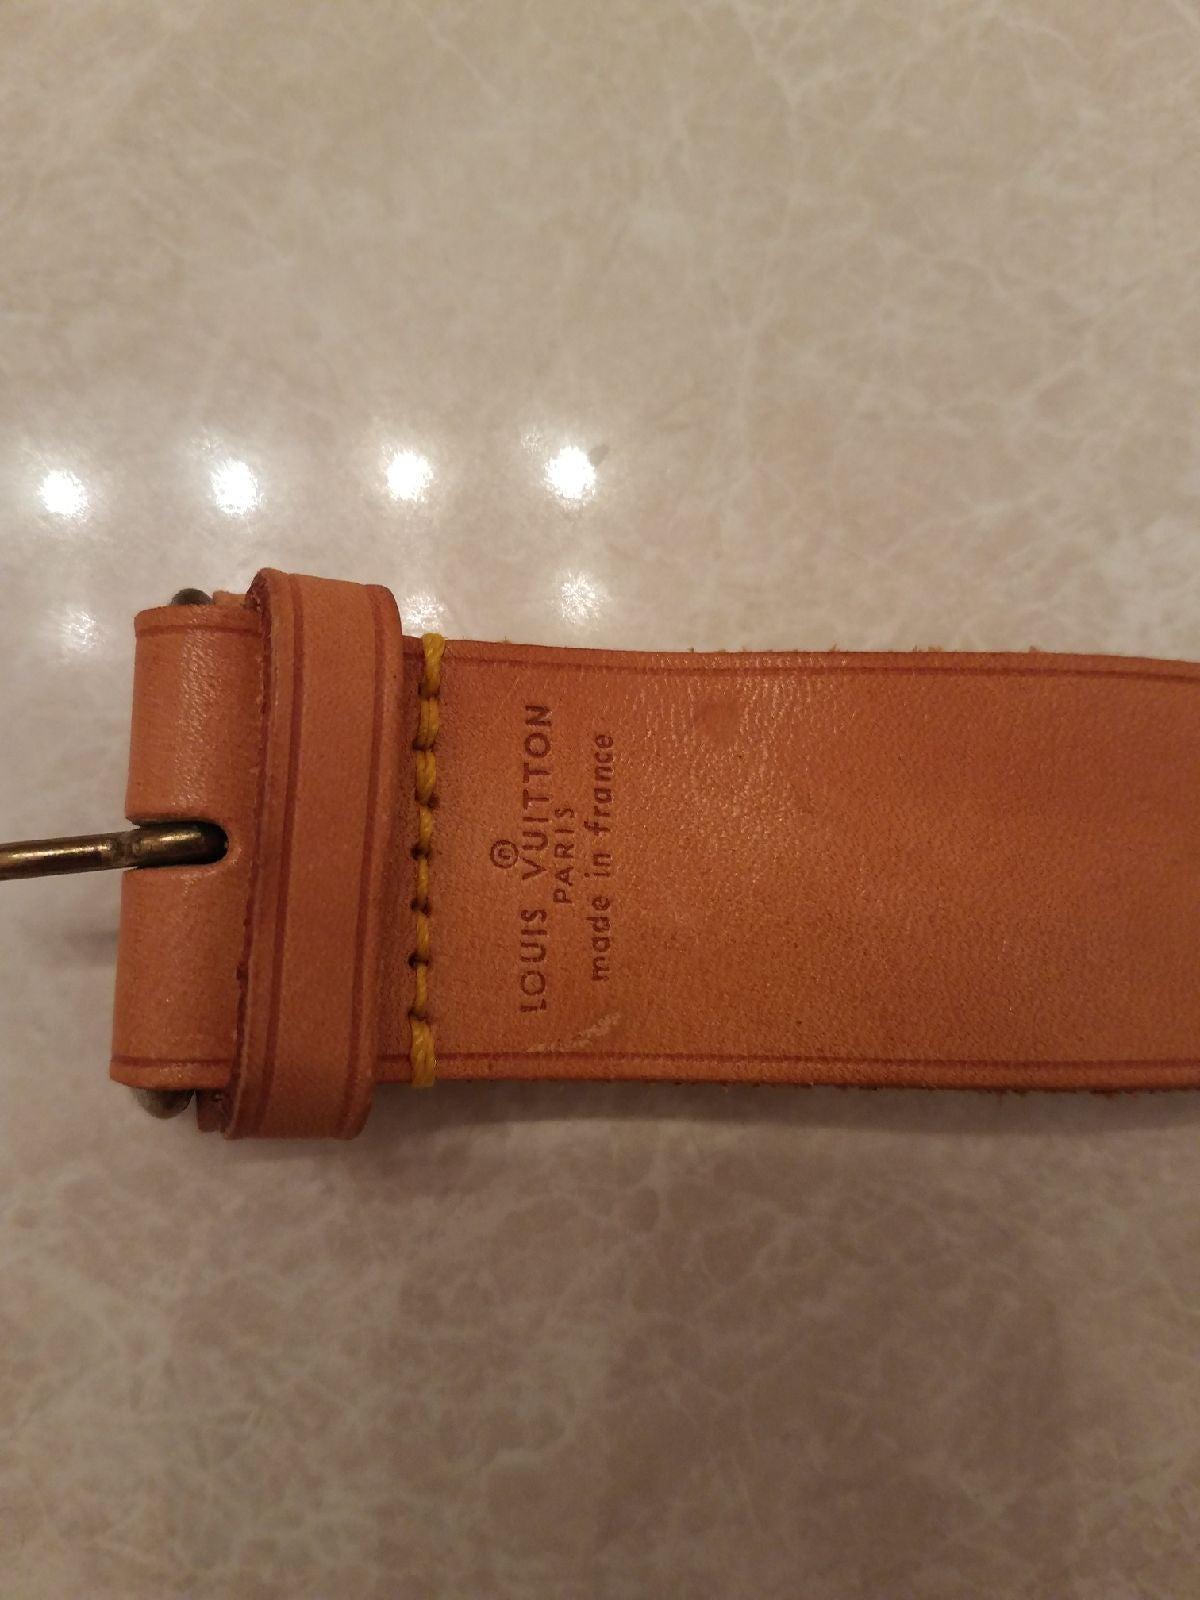 Louis Vuitton luggage tag/ bracelet